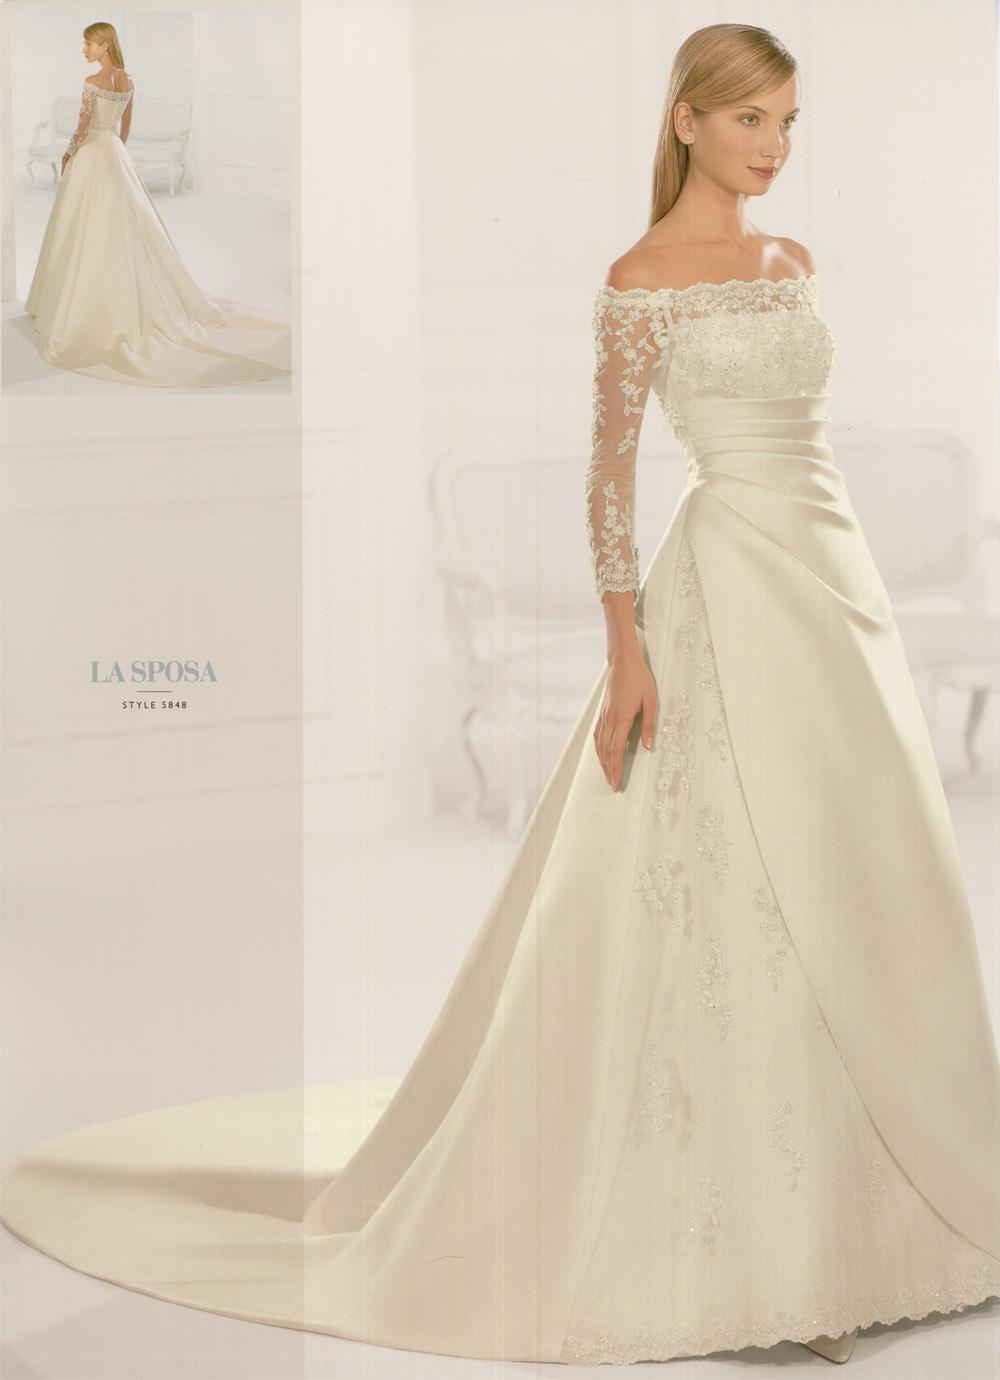 Long Sleeve Wedding Dresses Modern : Modern of design sleeved wedding dresses